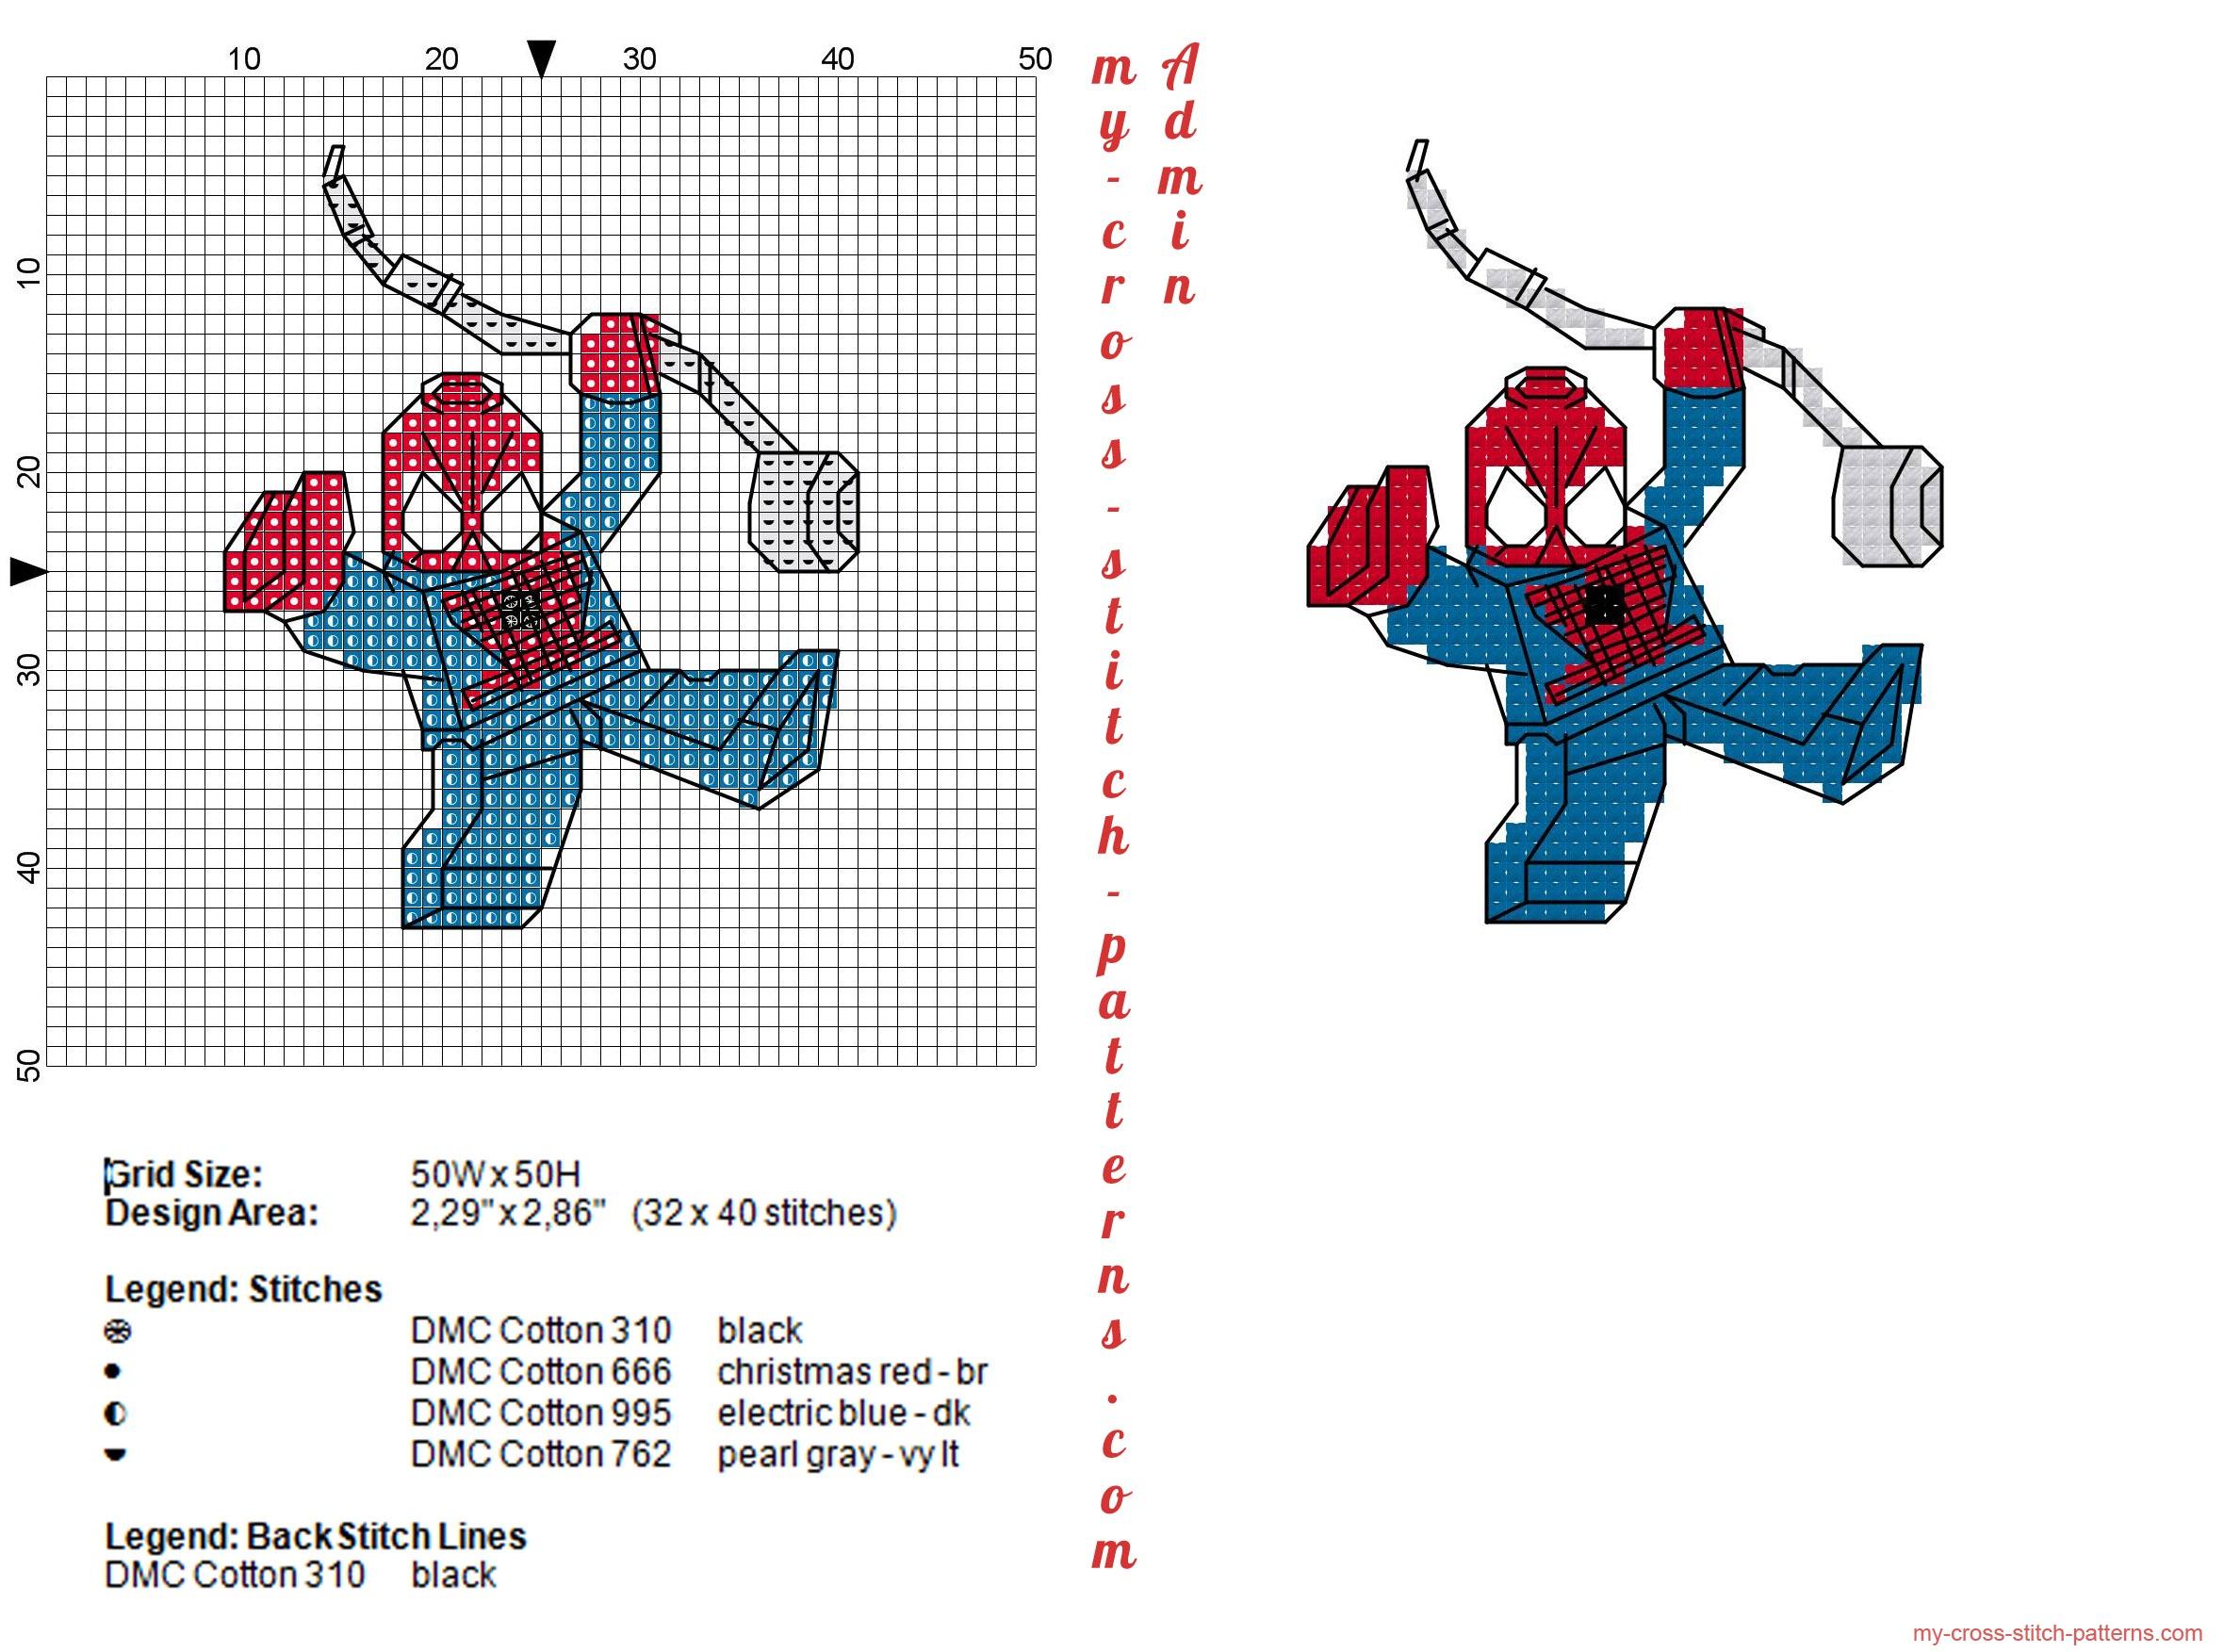 lego_spiderman_cross_stitch_pattern_32x40_4_dmc_threads